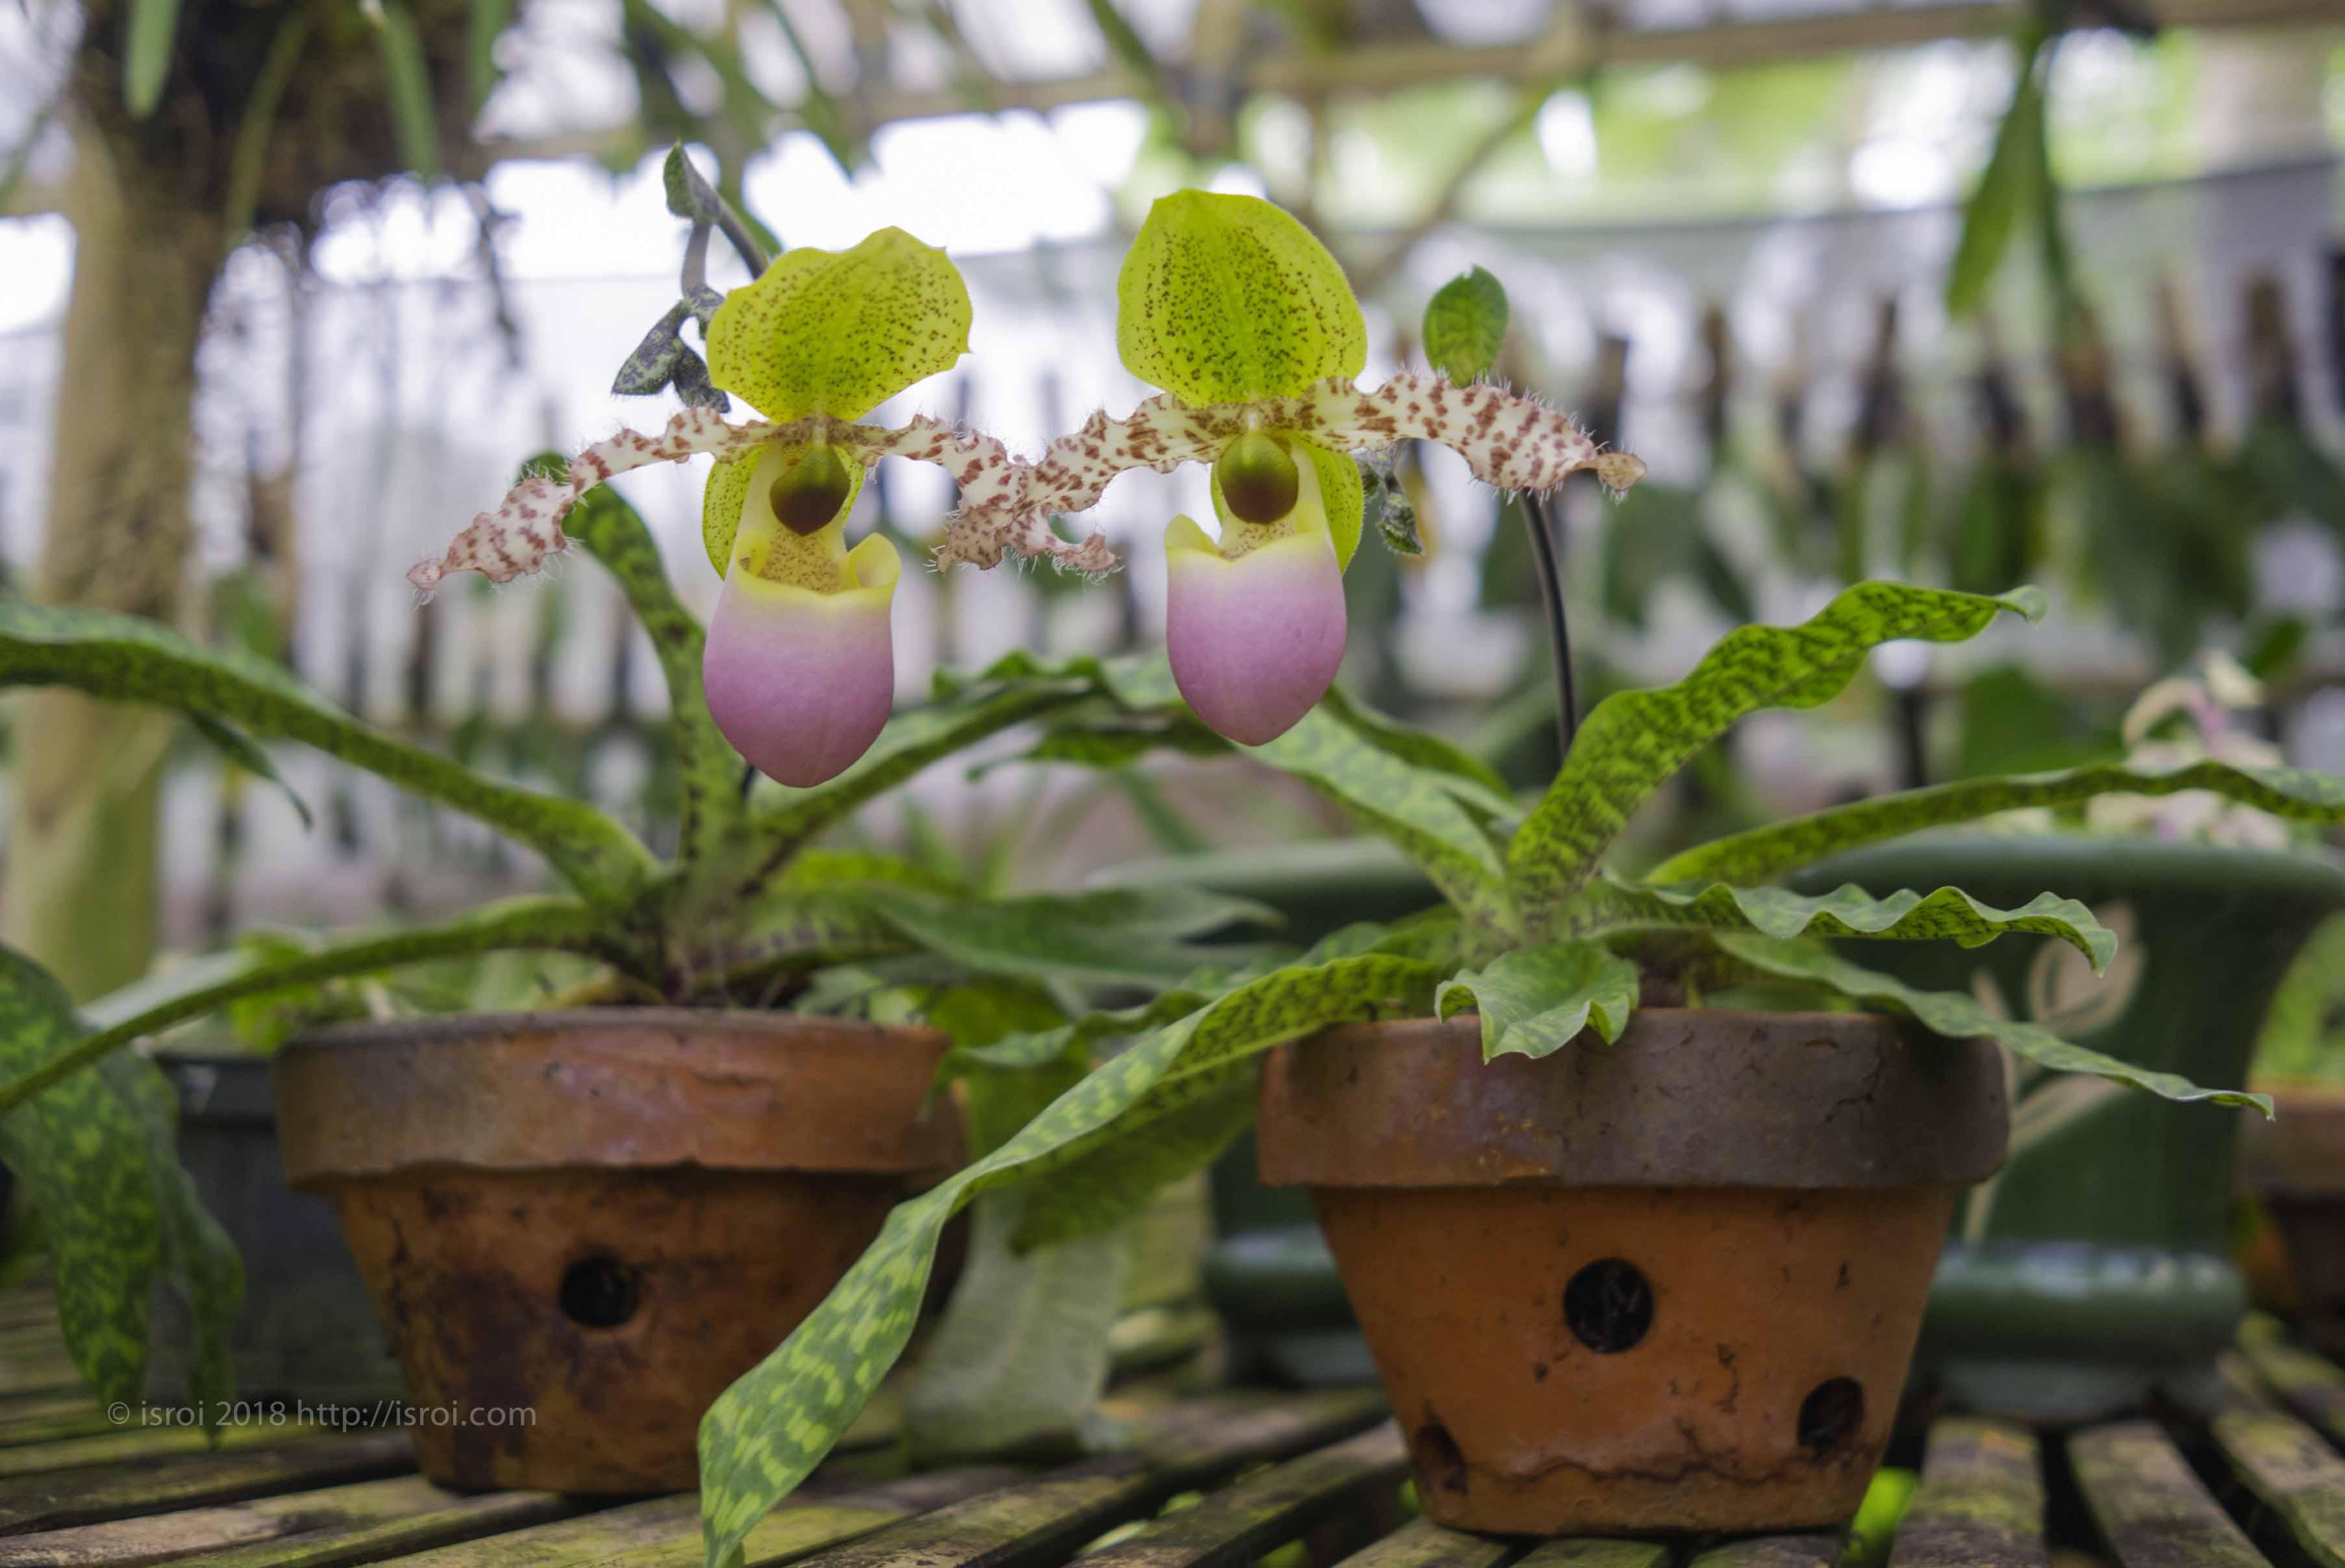 jual Anggrek kantong spesies Paphiopedilum dodyanum